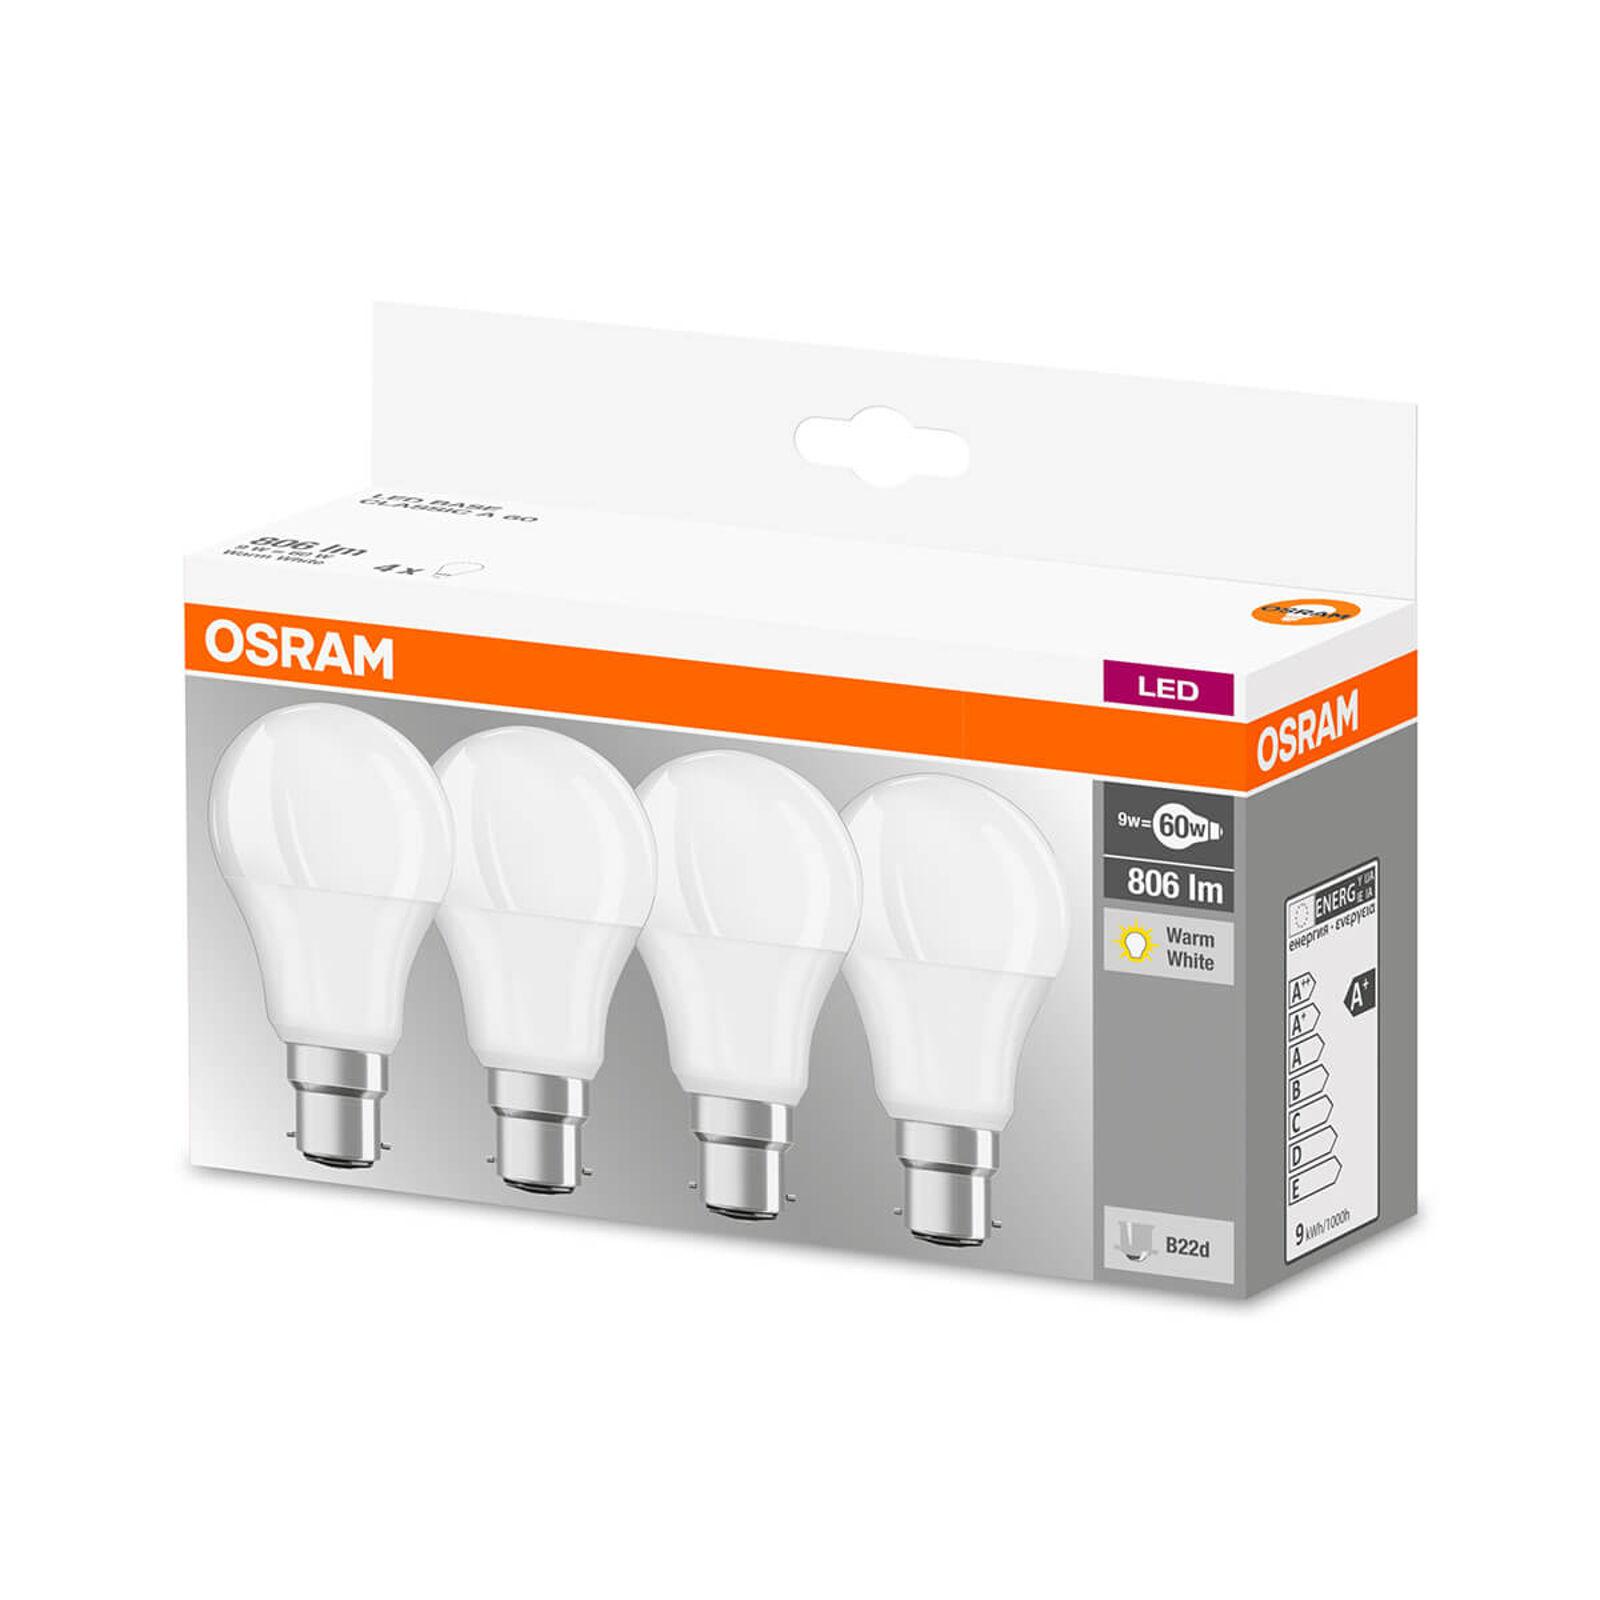 OSRAM LED-lampa B22d 9W, varmvit, 806 lumen, 4-pack